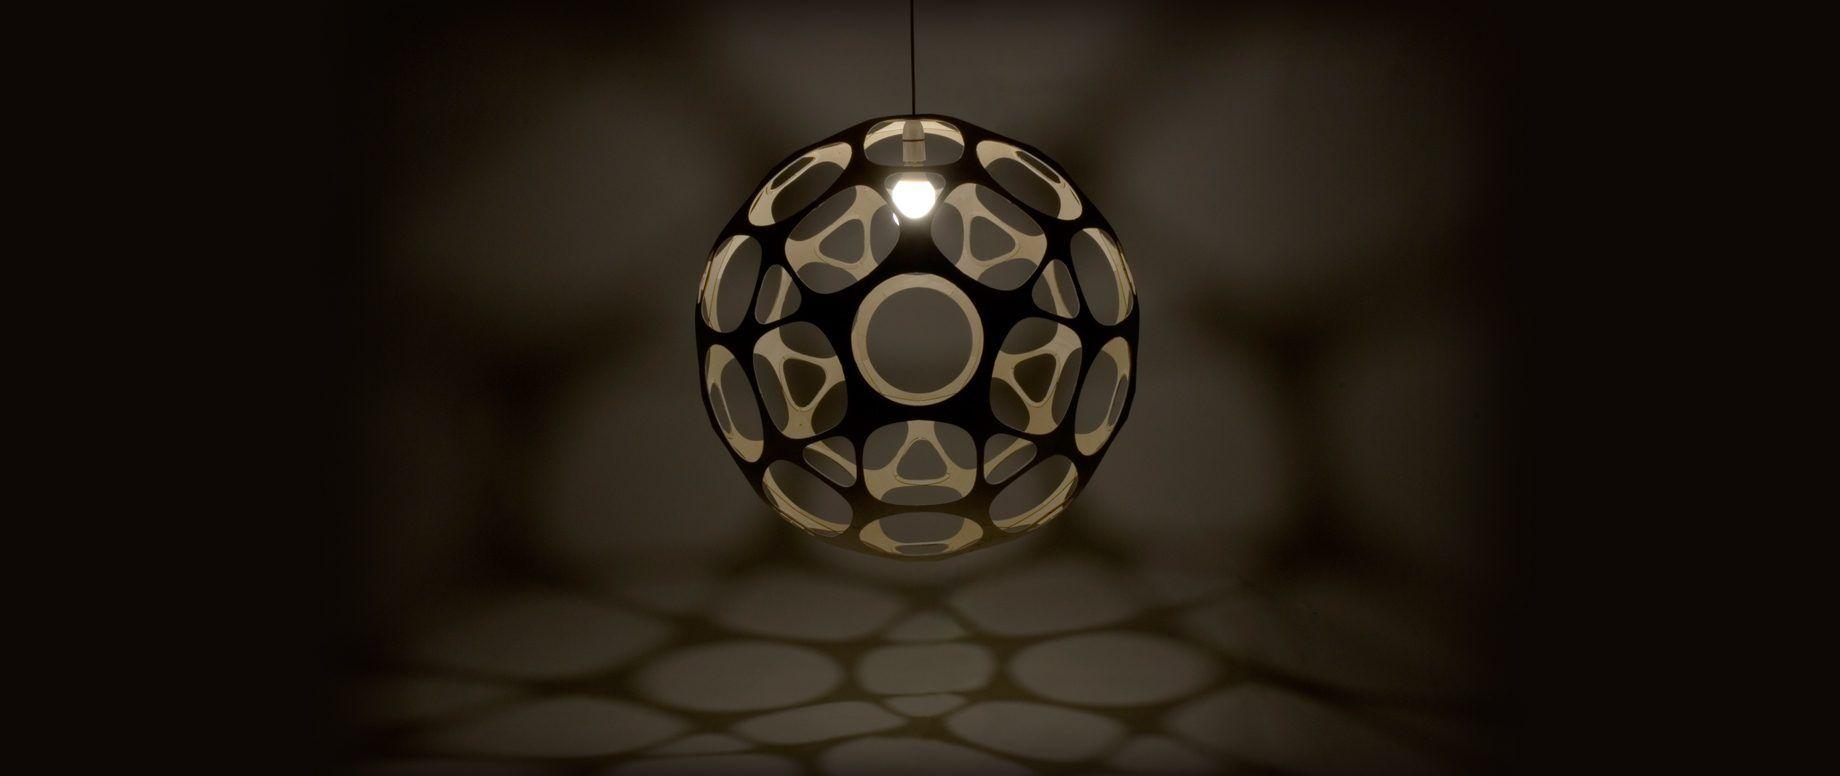 Borealis lamp by Lazerian